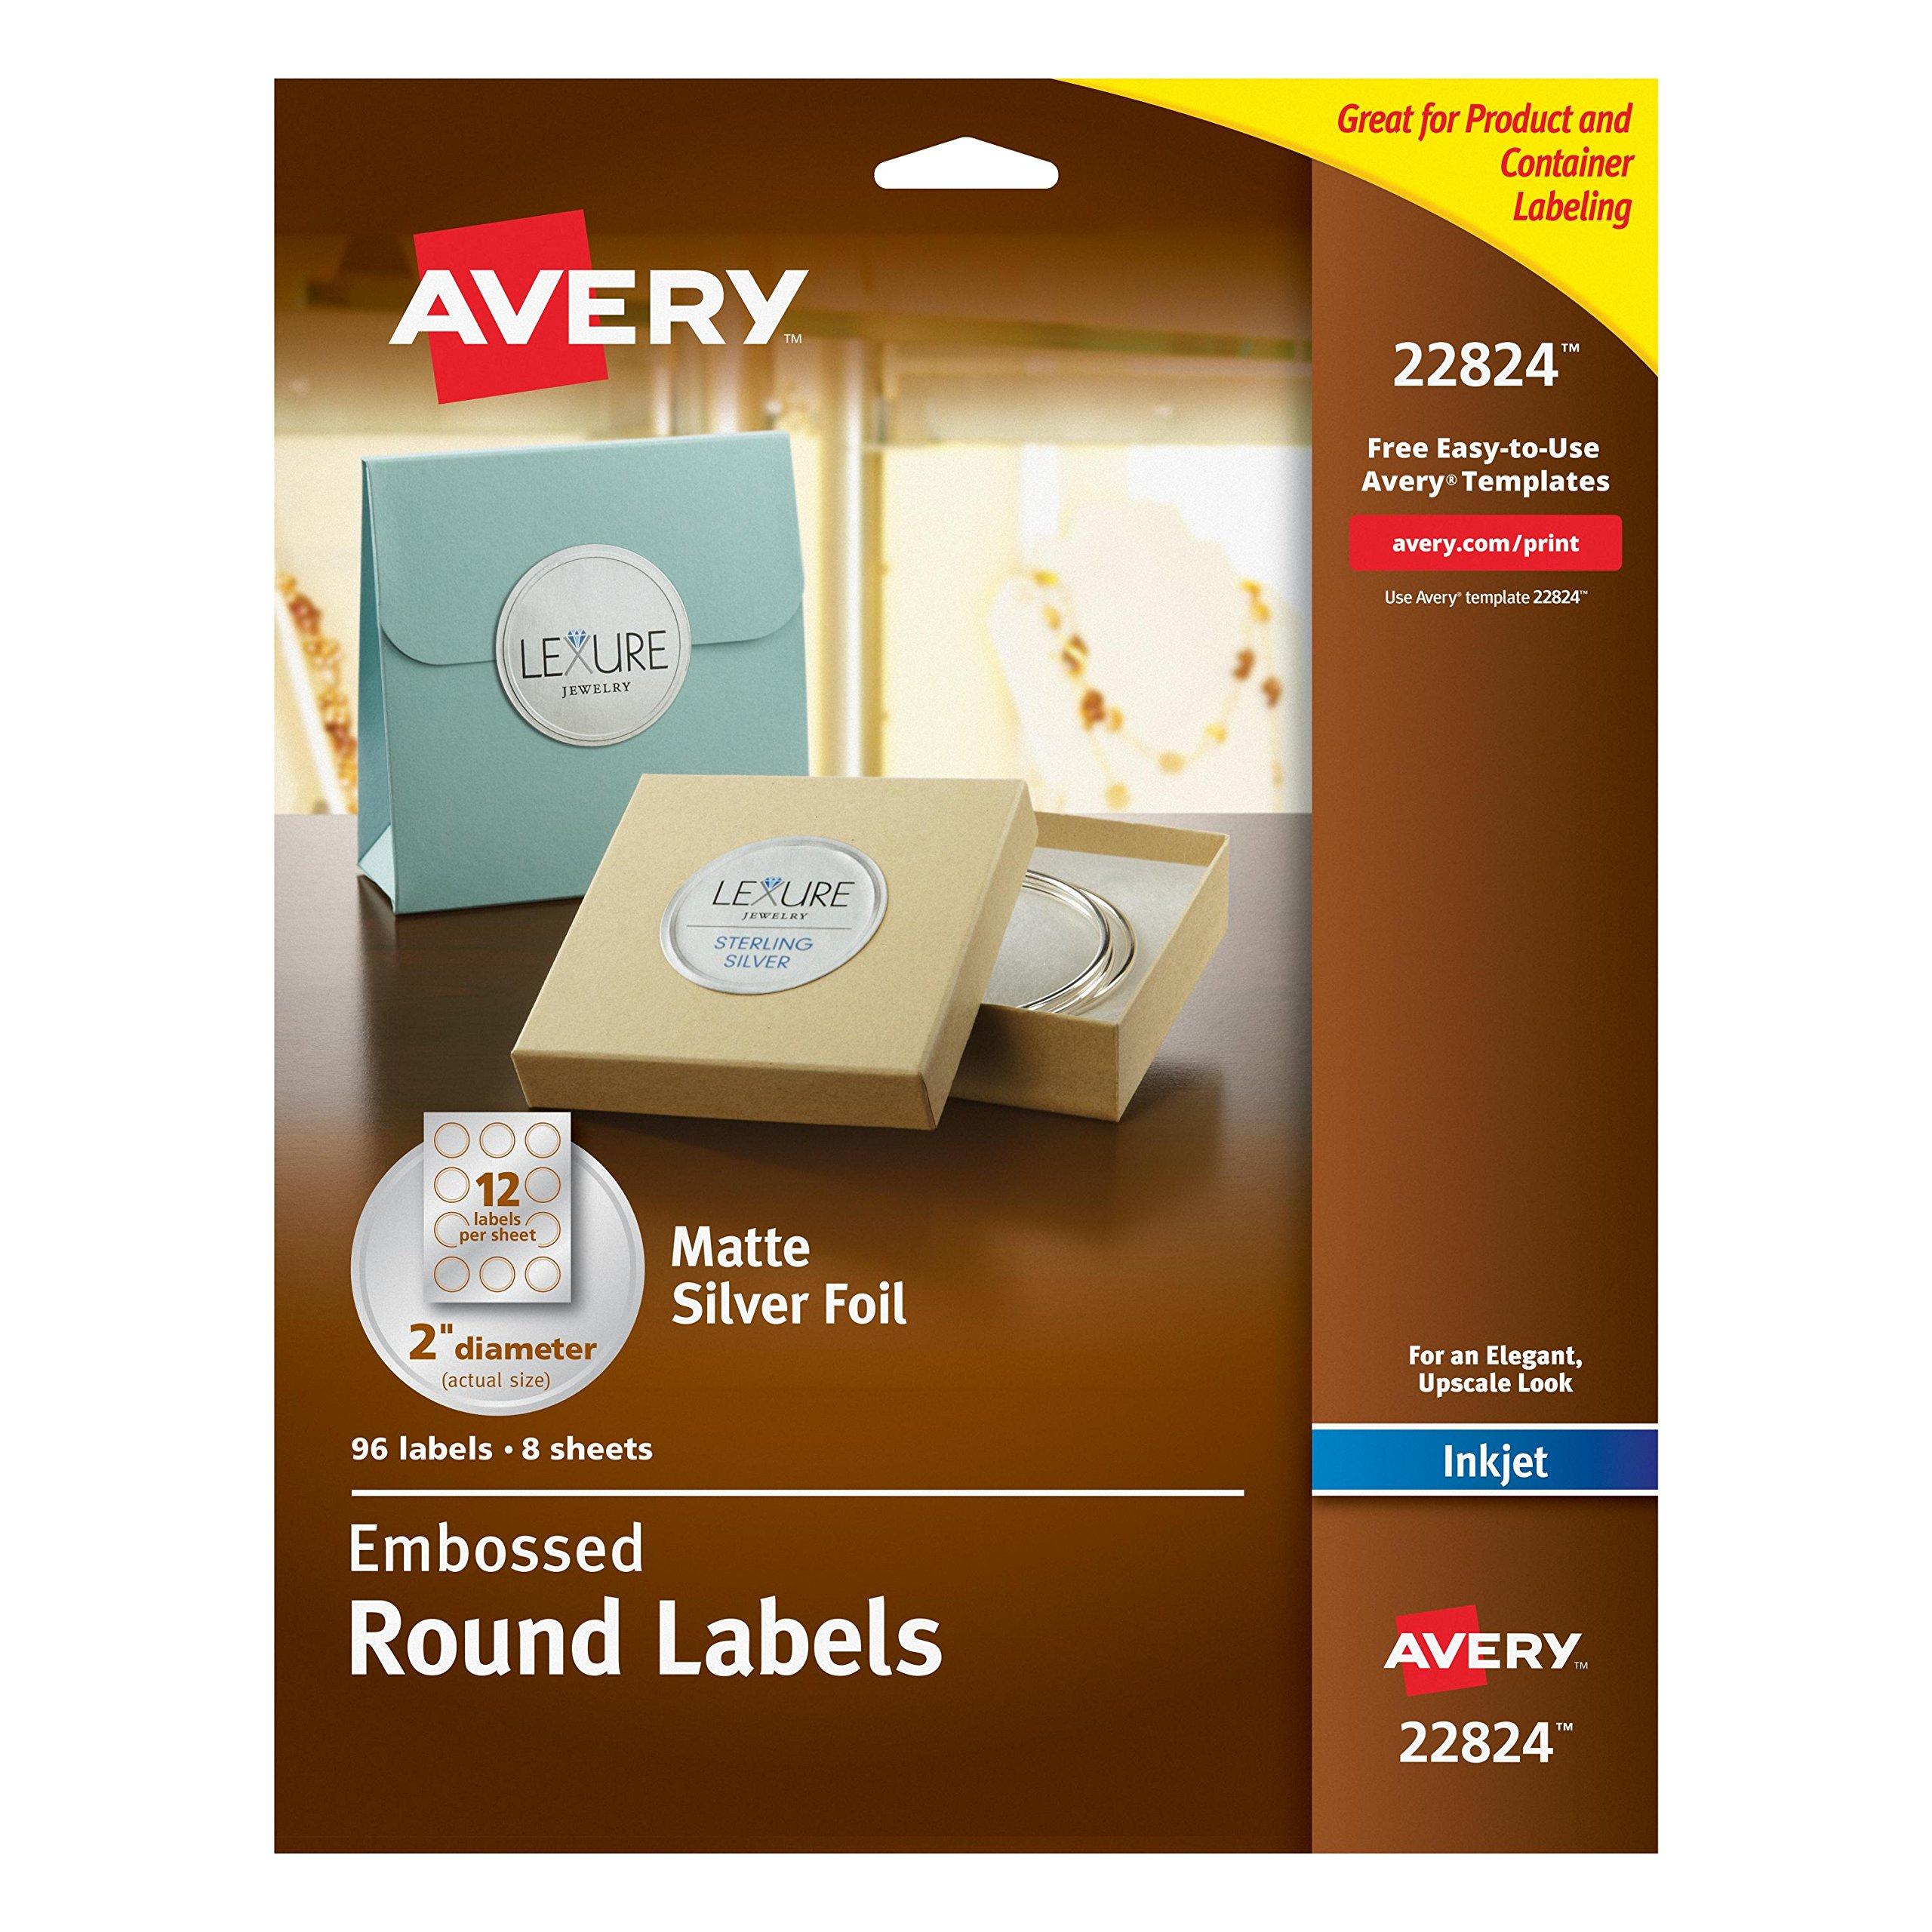 Avery Easy Peel Embossed Matte Silver Foil Round Labels, 2'' Diameter, Pack of 96 (22824)